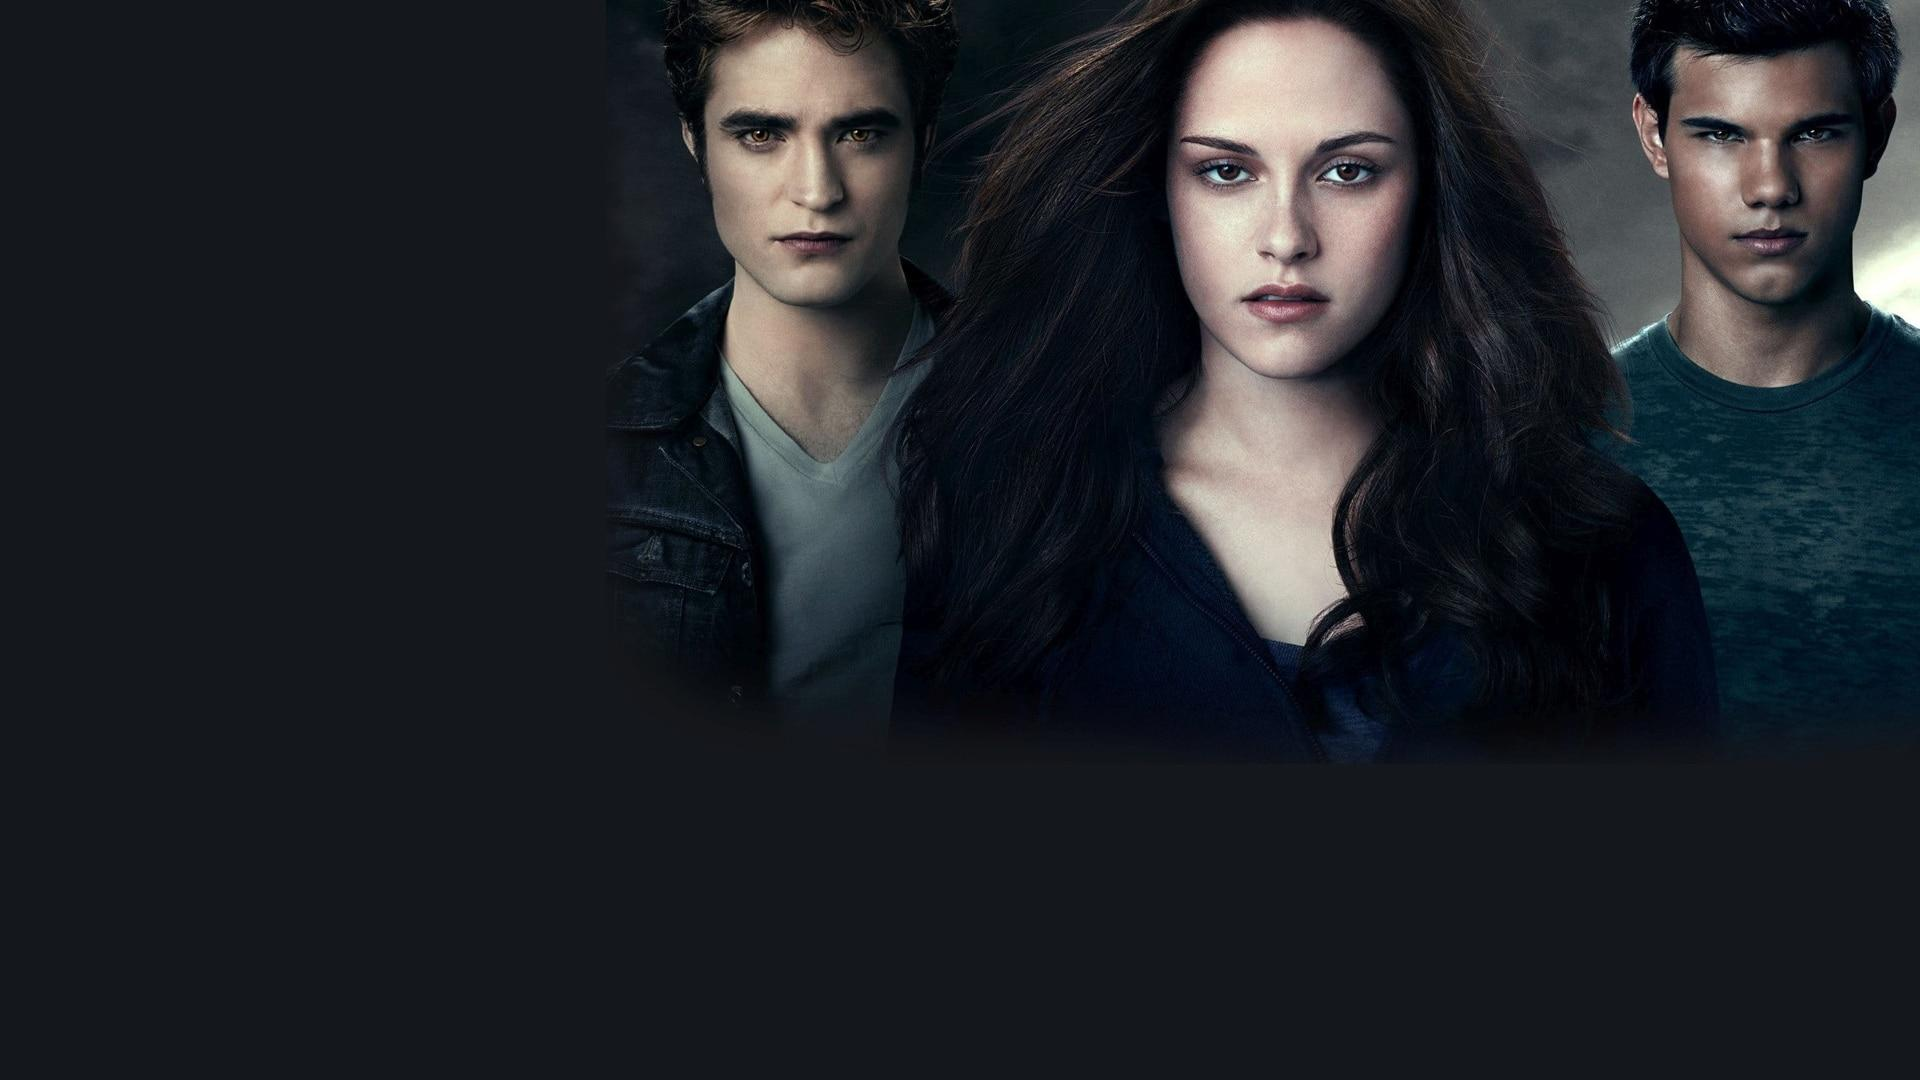 Paramount The Twilight saga: Eclipse